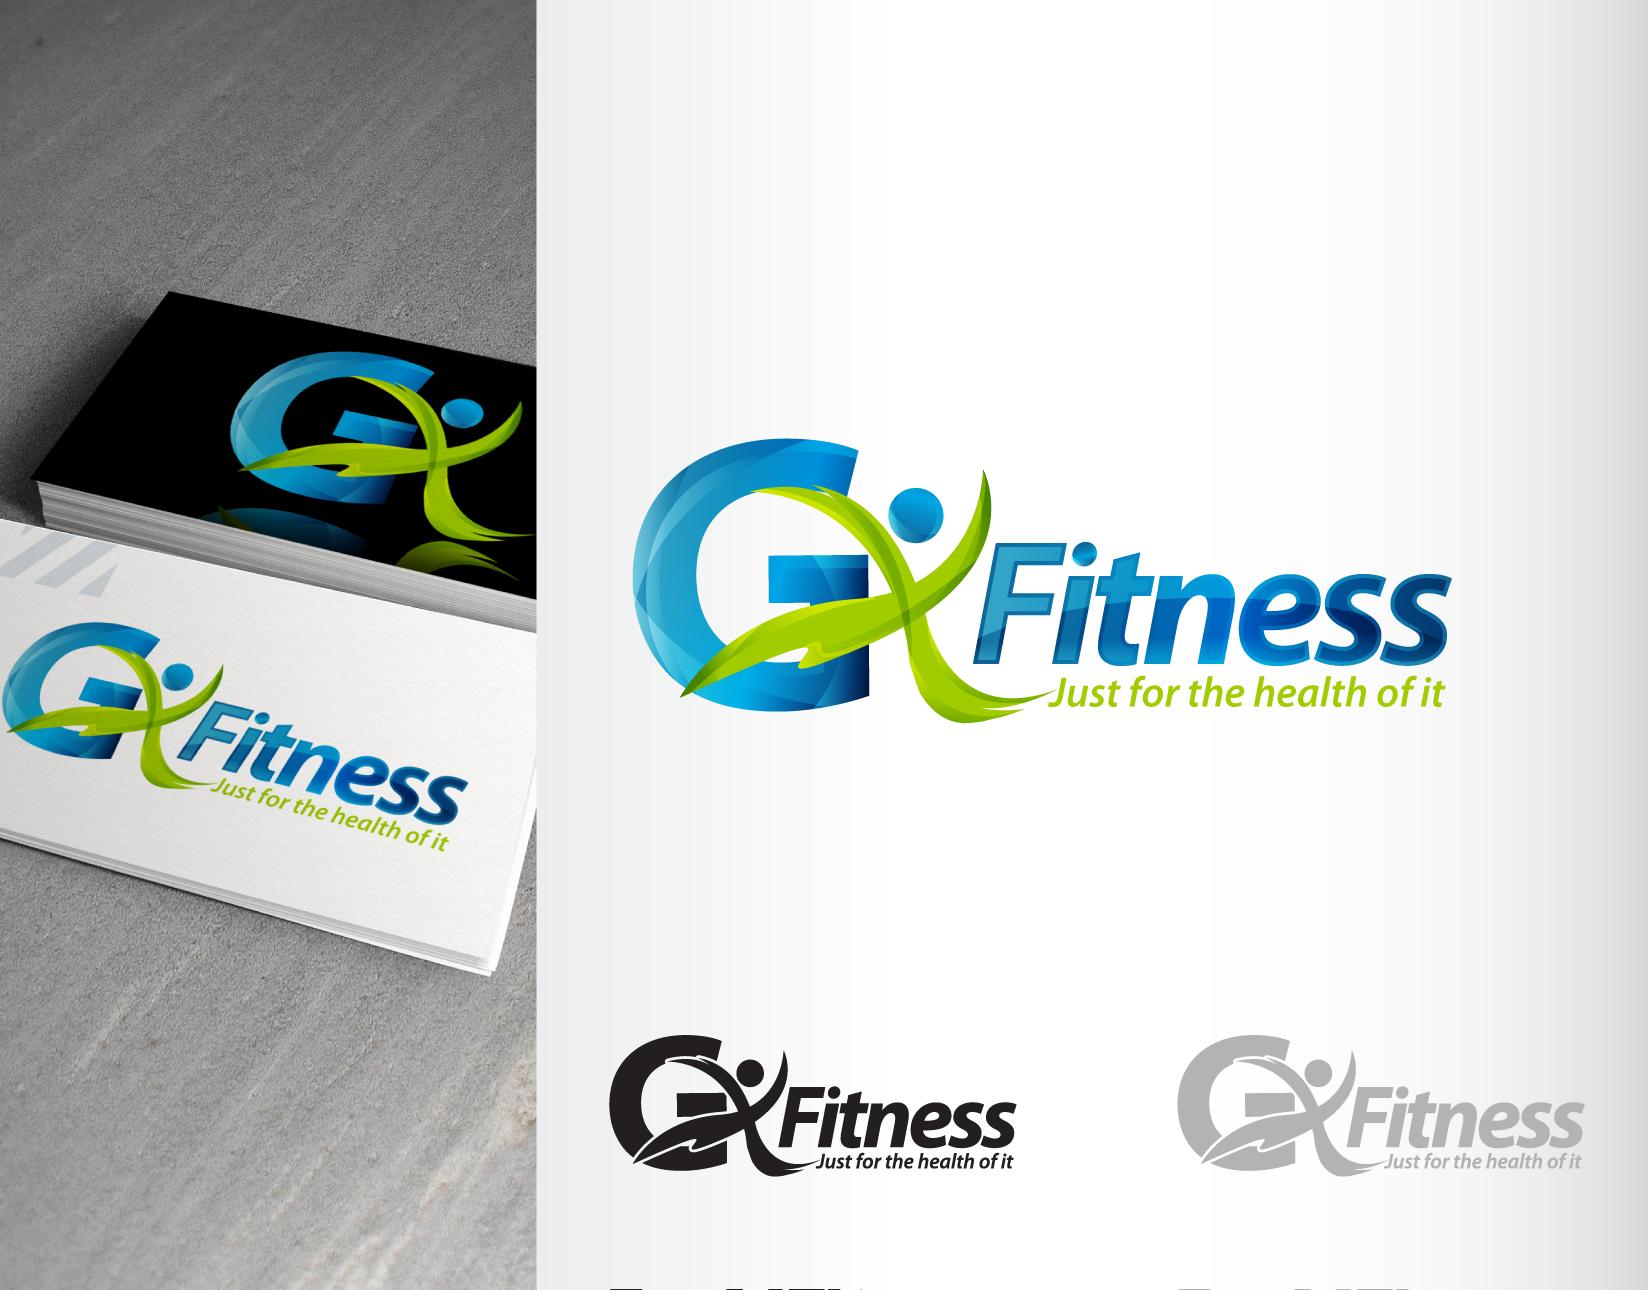 GX Fitness needs a new logo